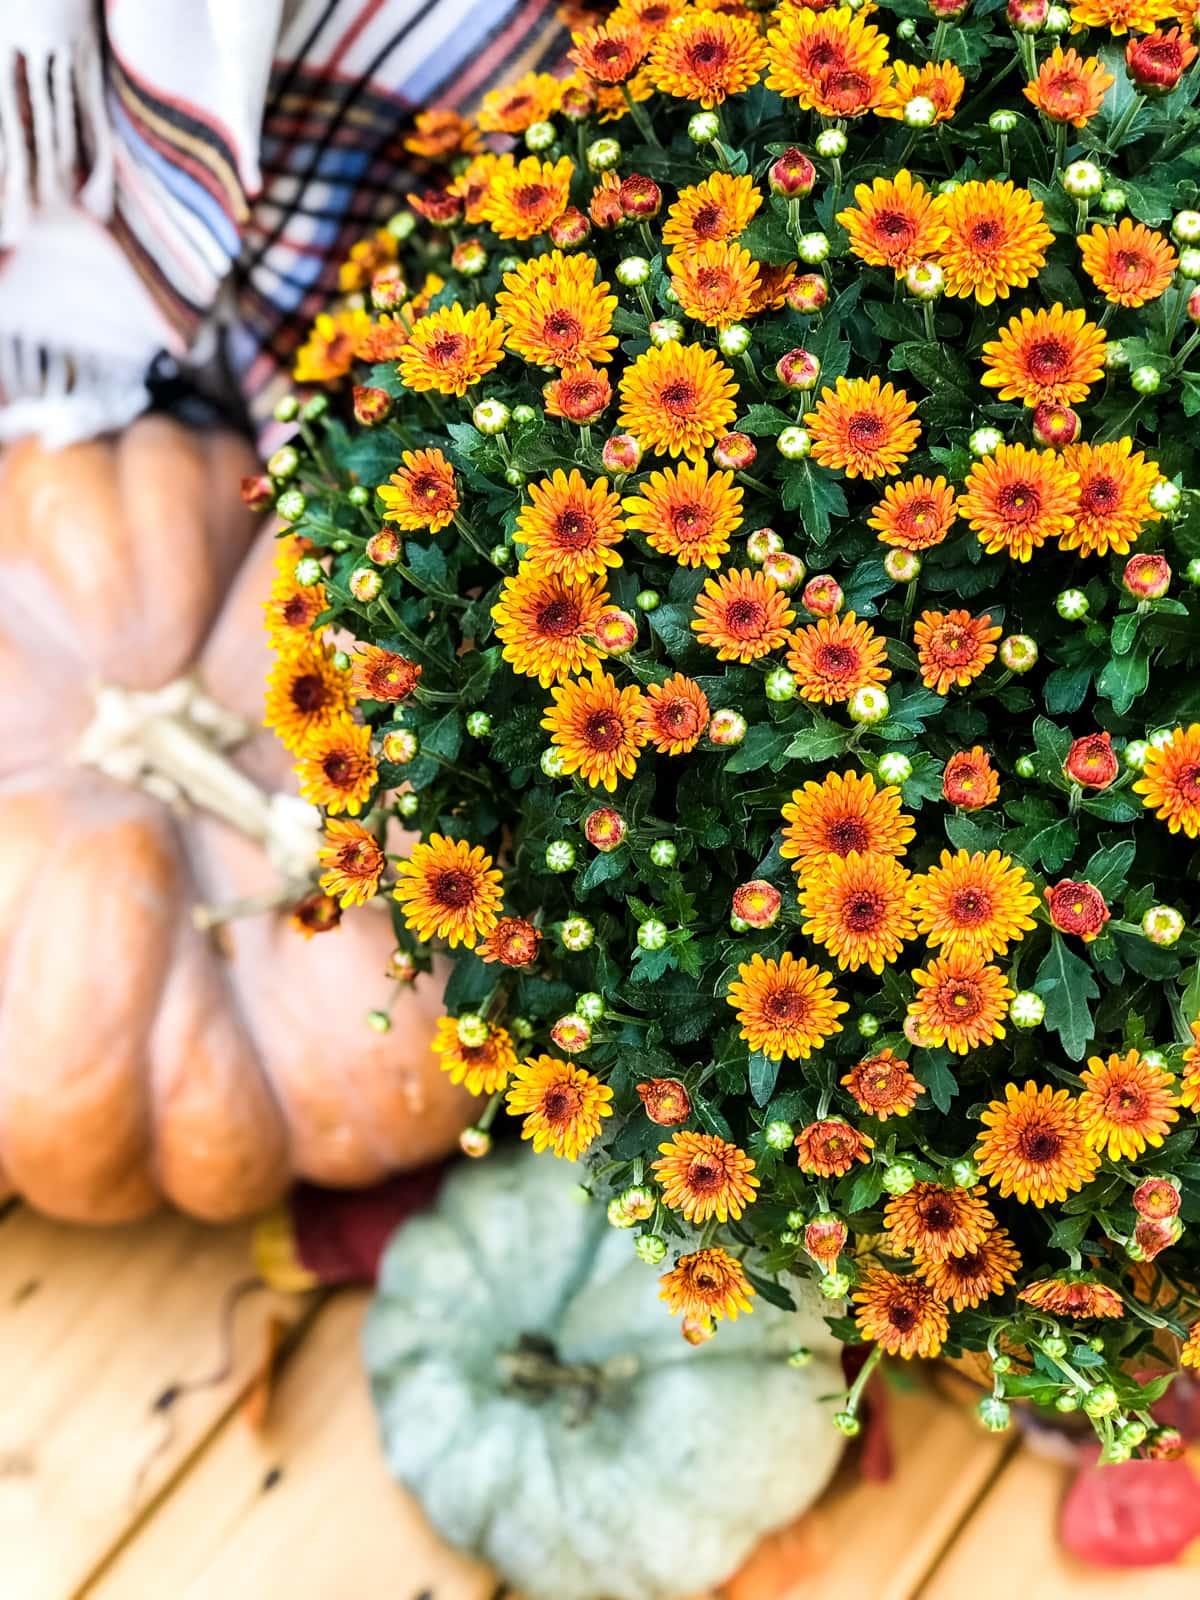 A top down view of an orange mum and pumpkins